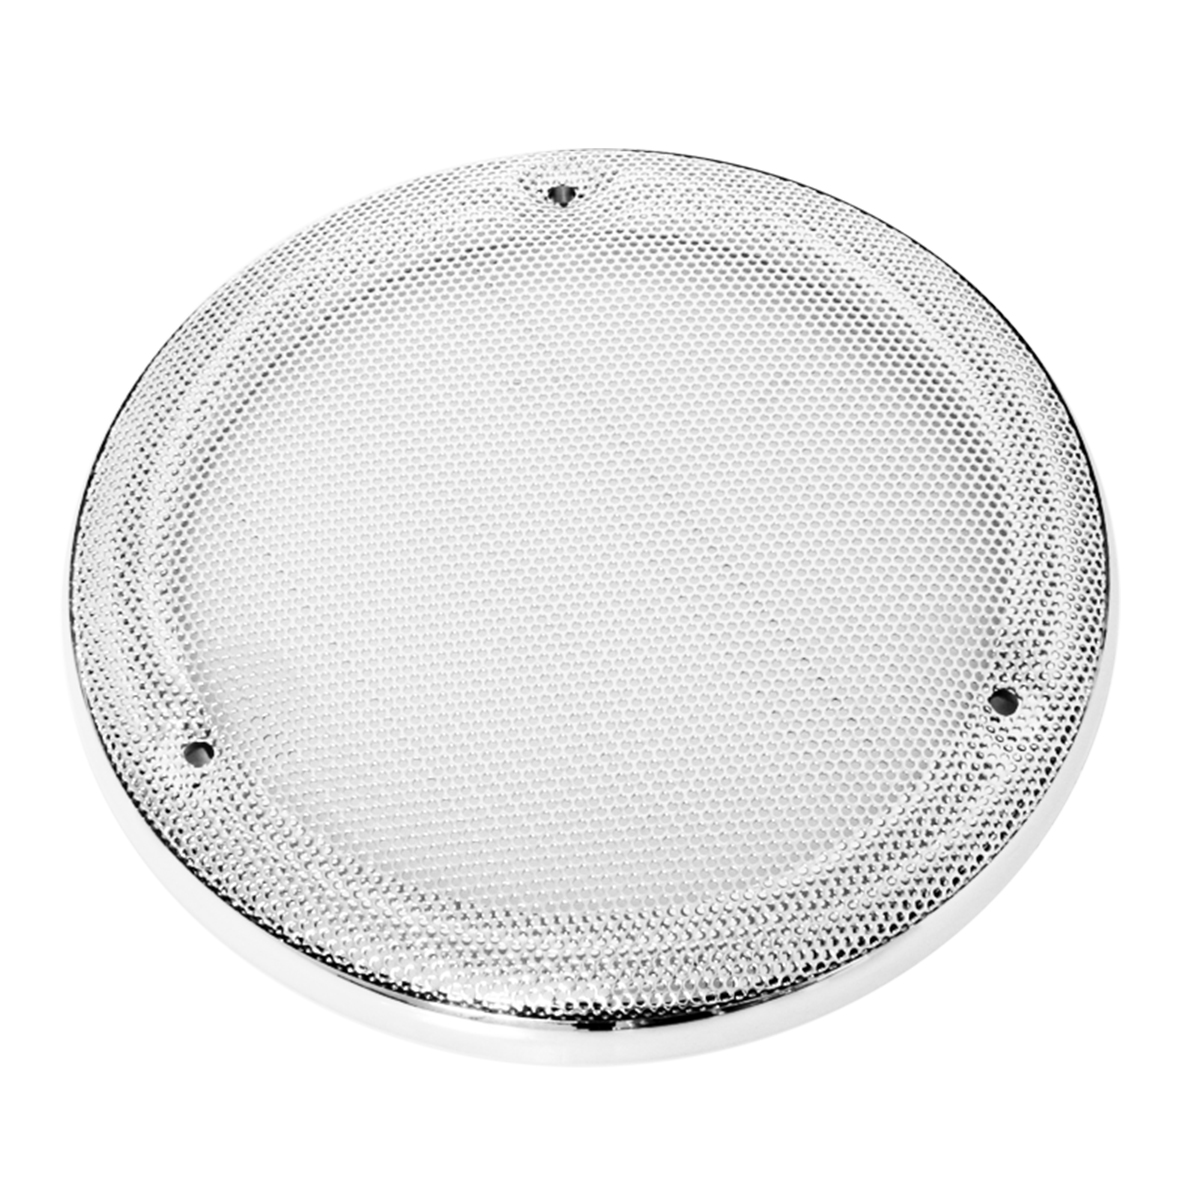 52022 Round Cab Ceiling Speaker Cover for Kenworth